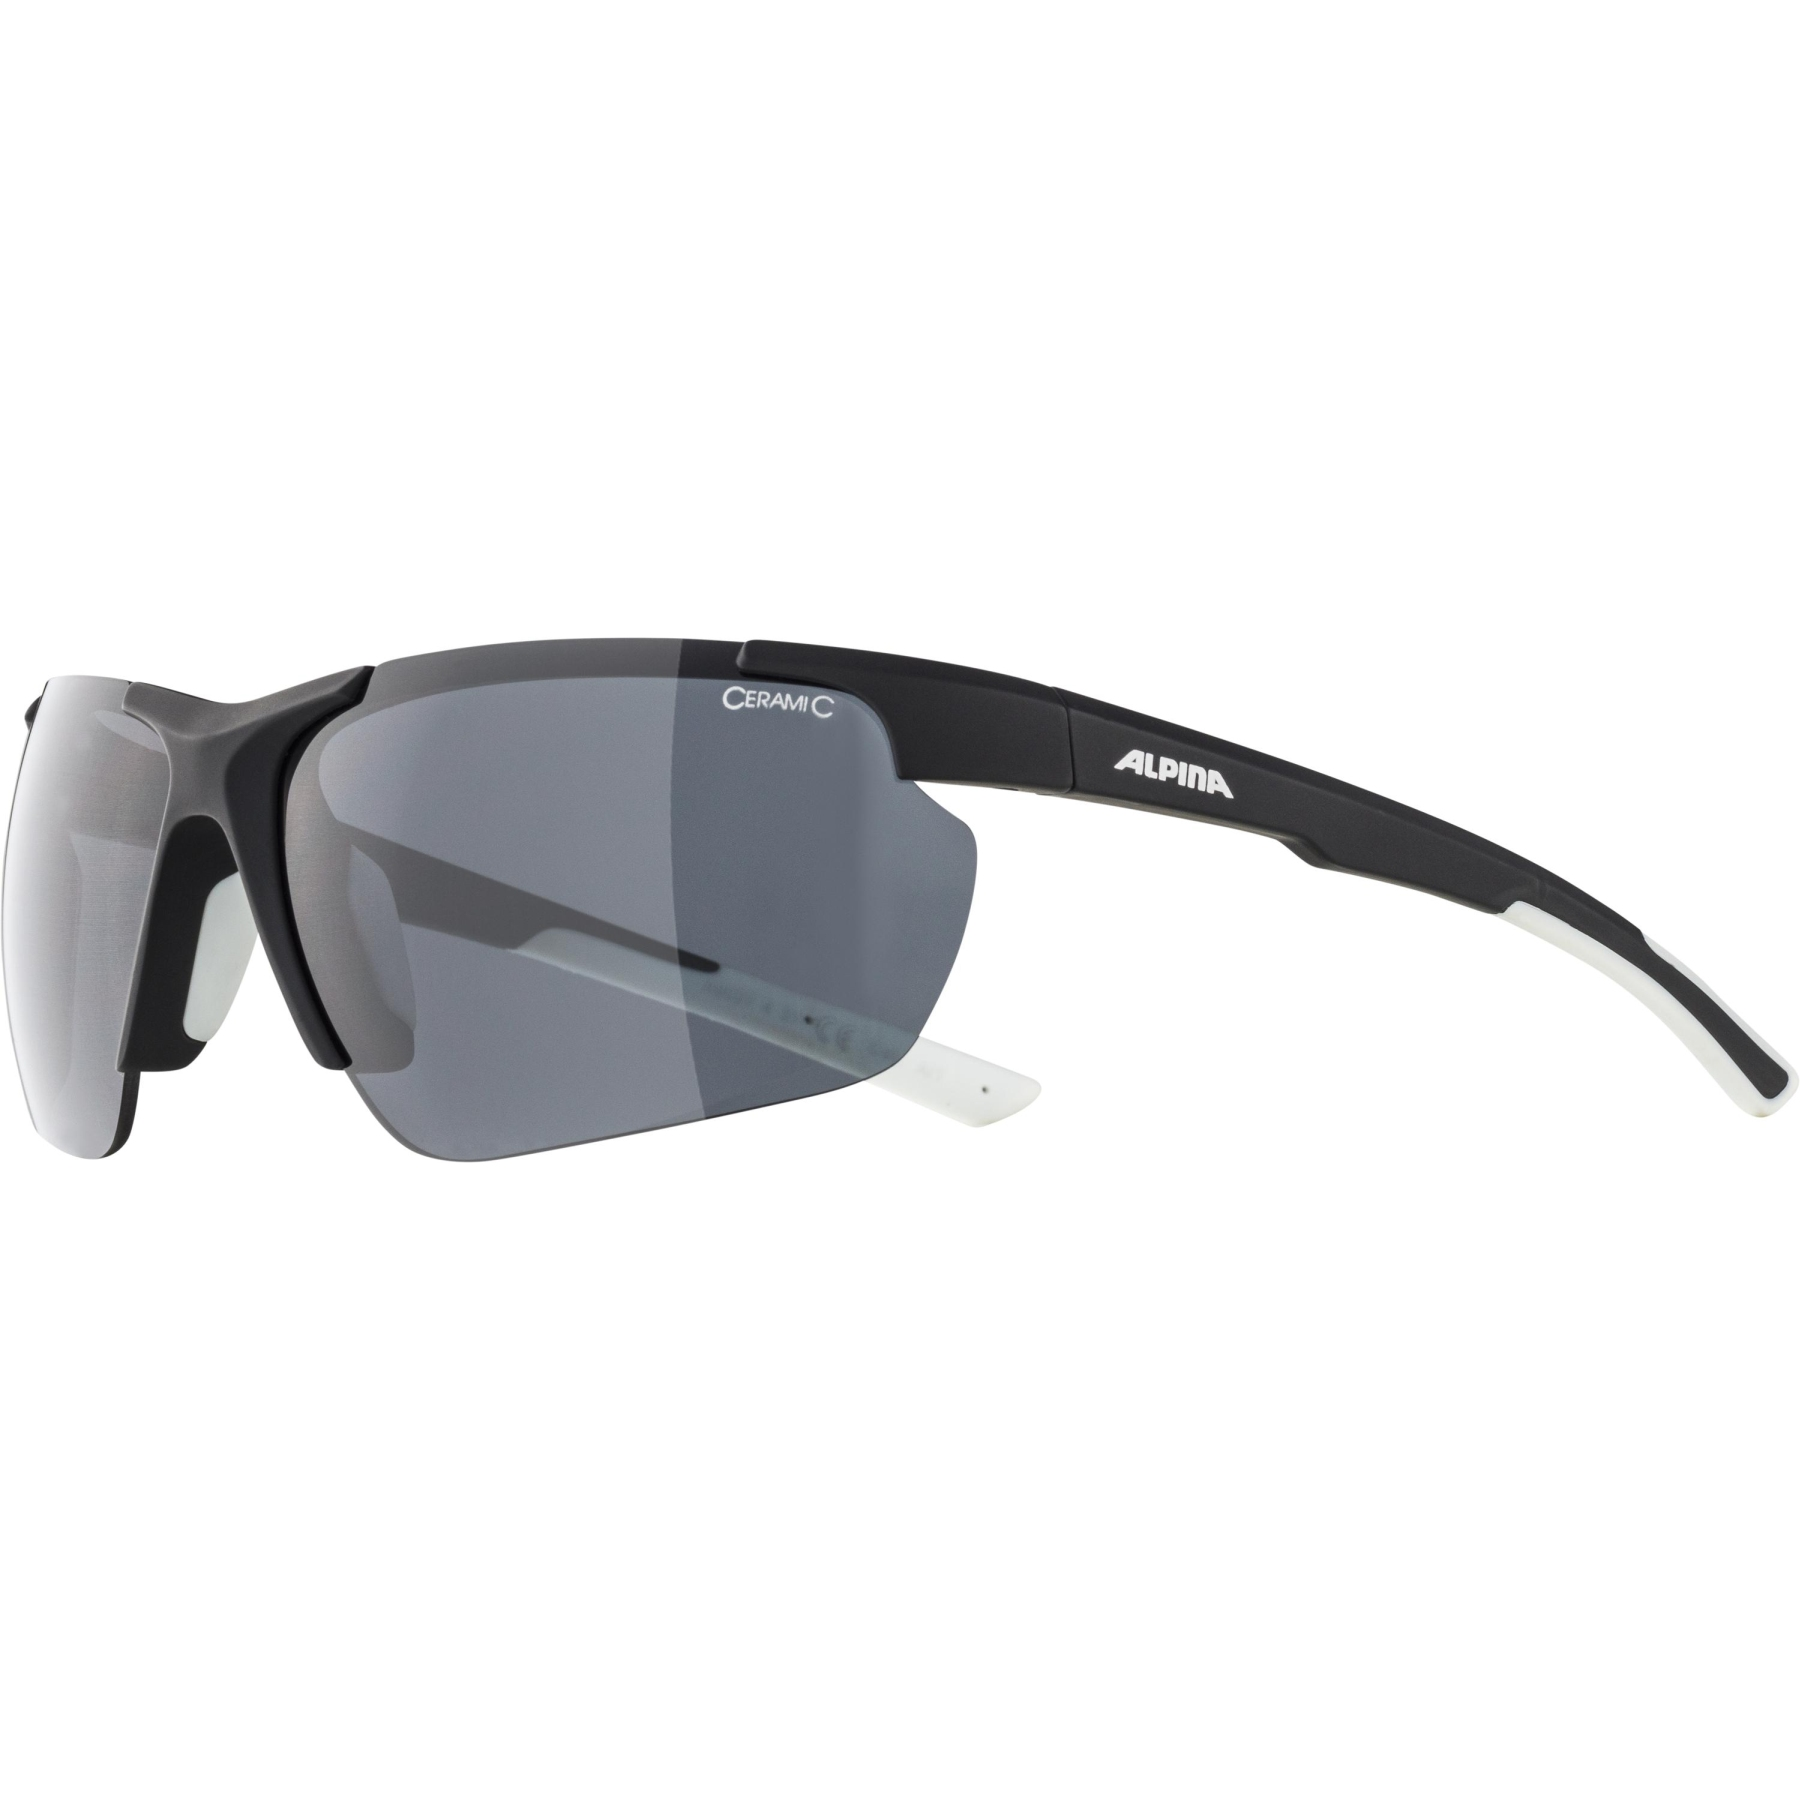 Image of Alpina Defey HR Glasses - black matt-white / black